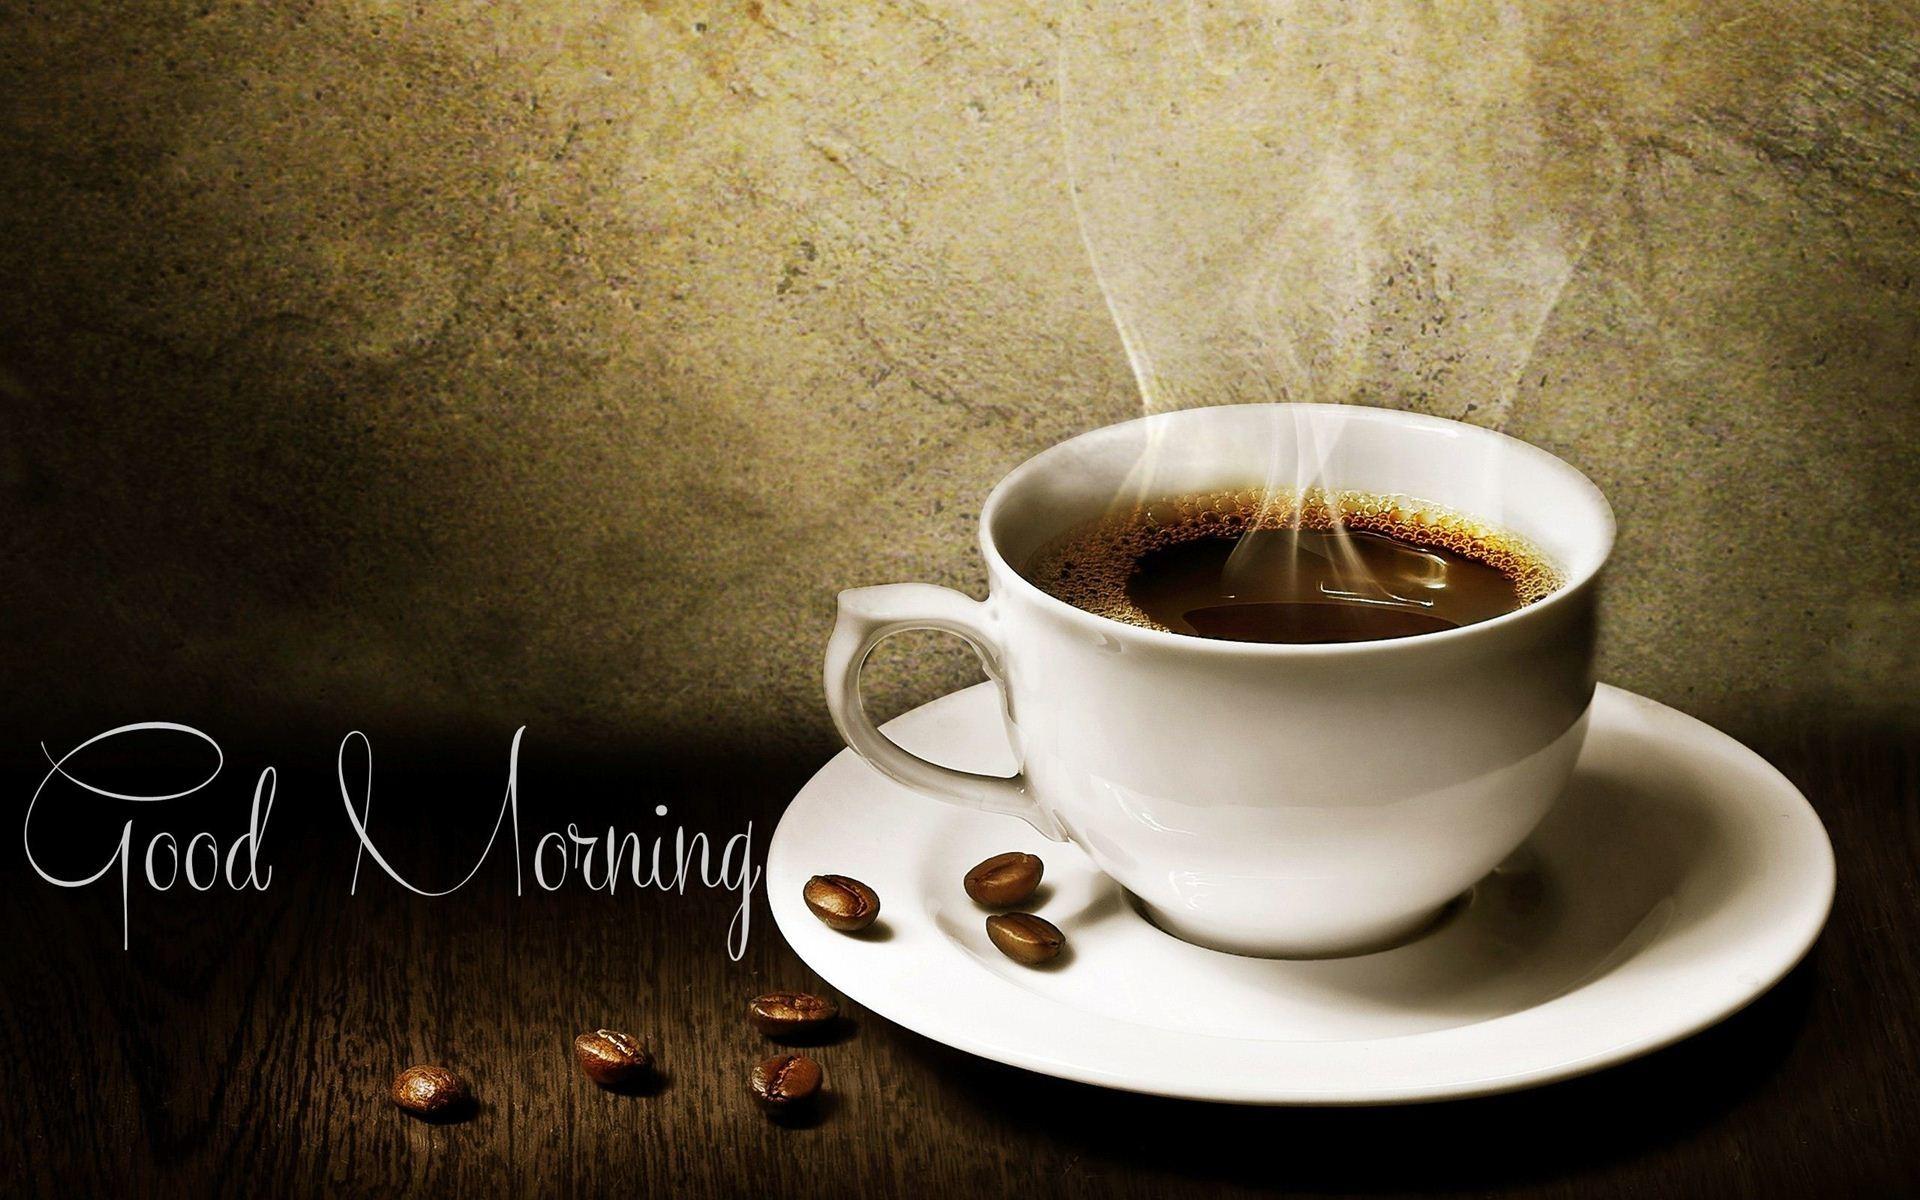 Beautiful Good Morning Wallpaper 75 Images